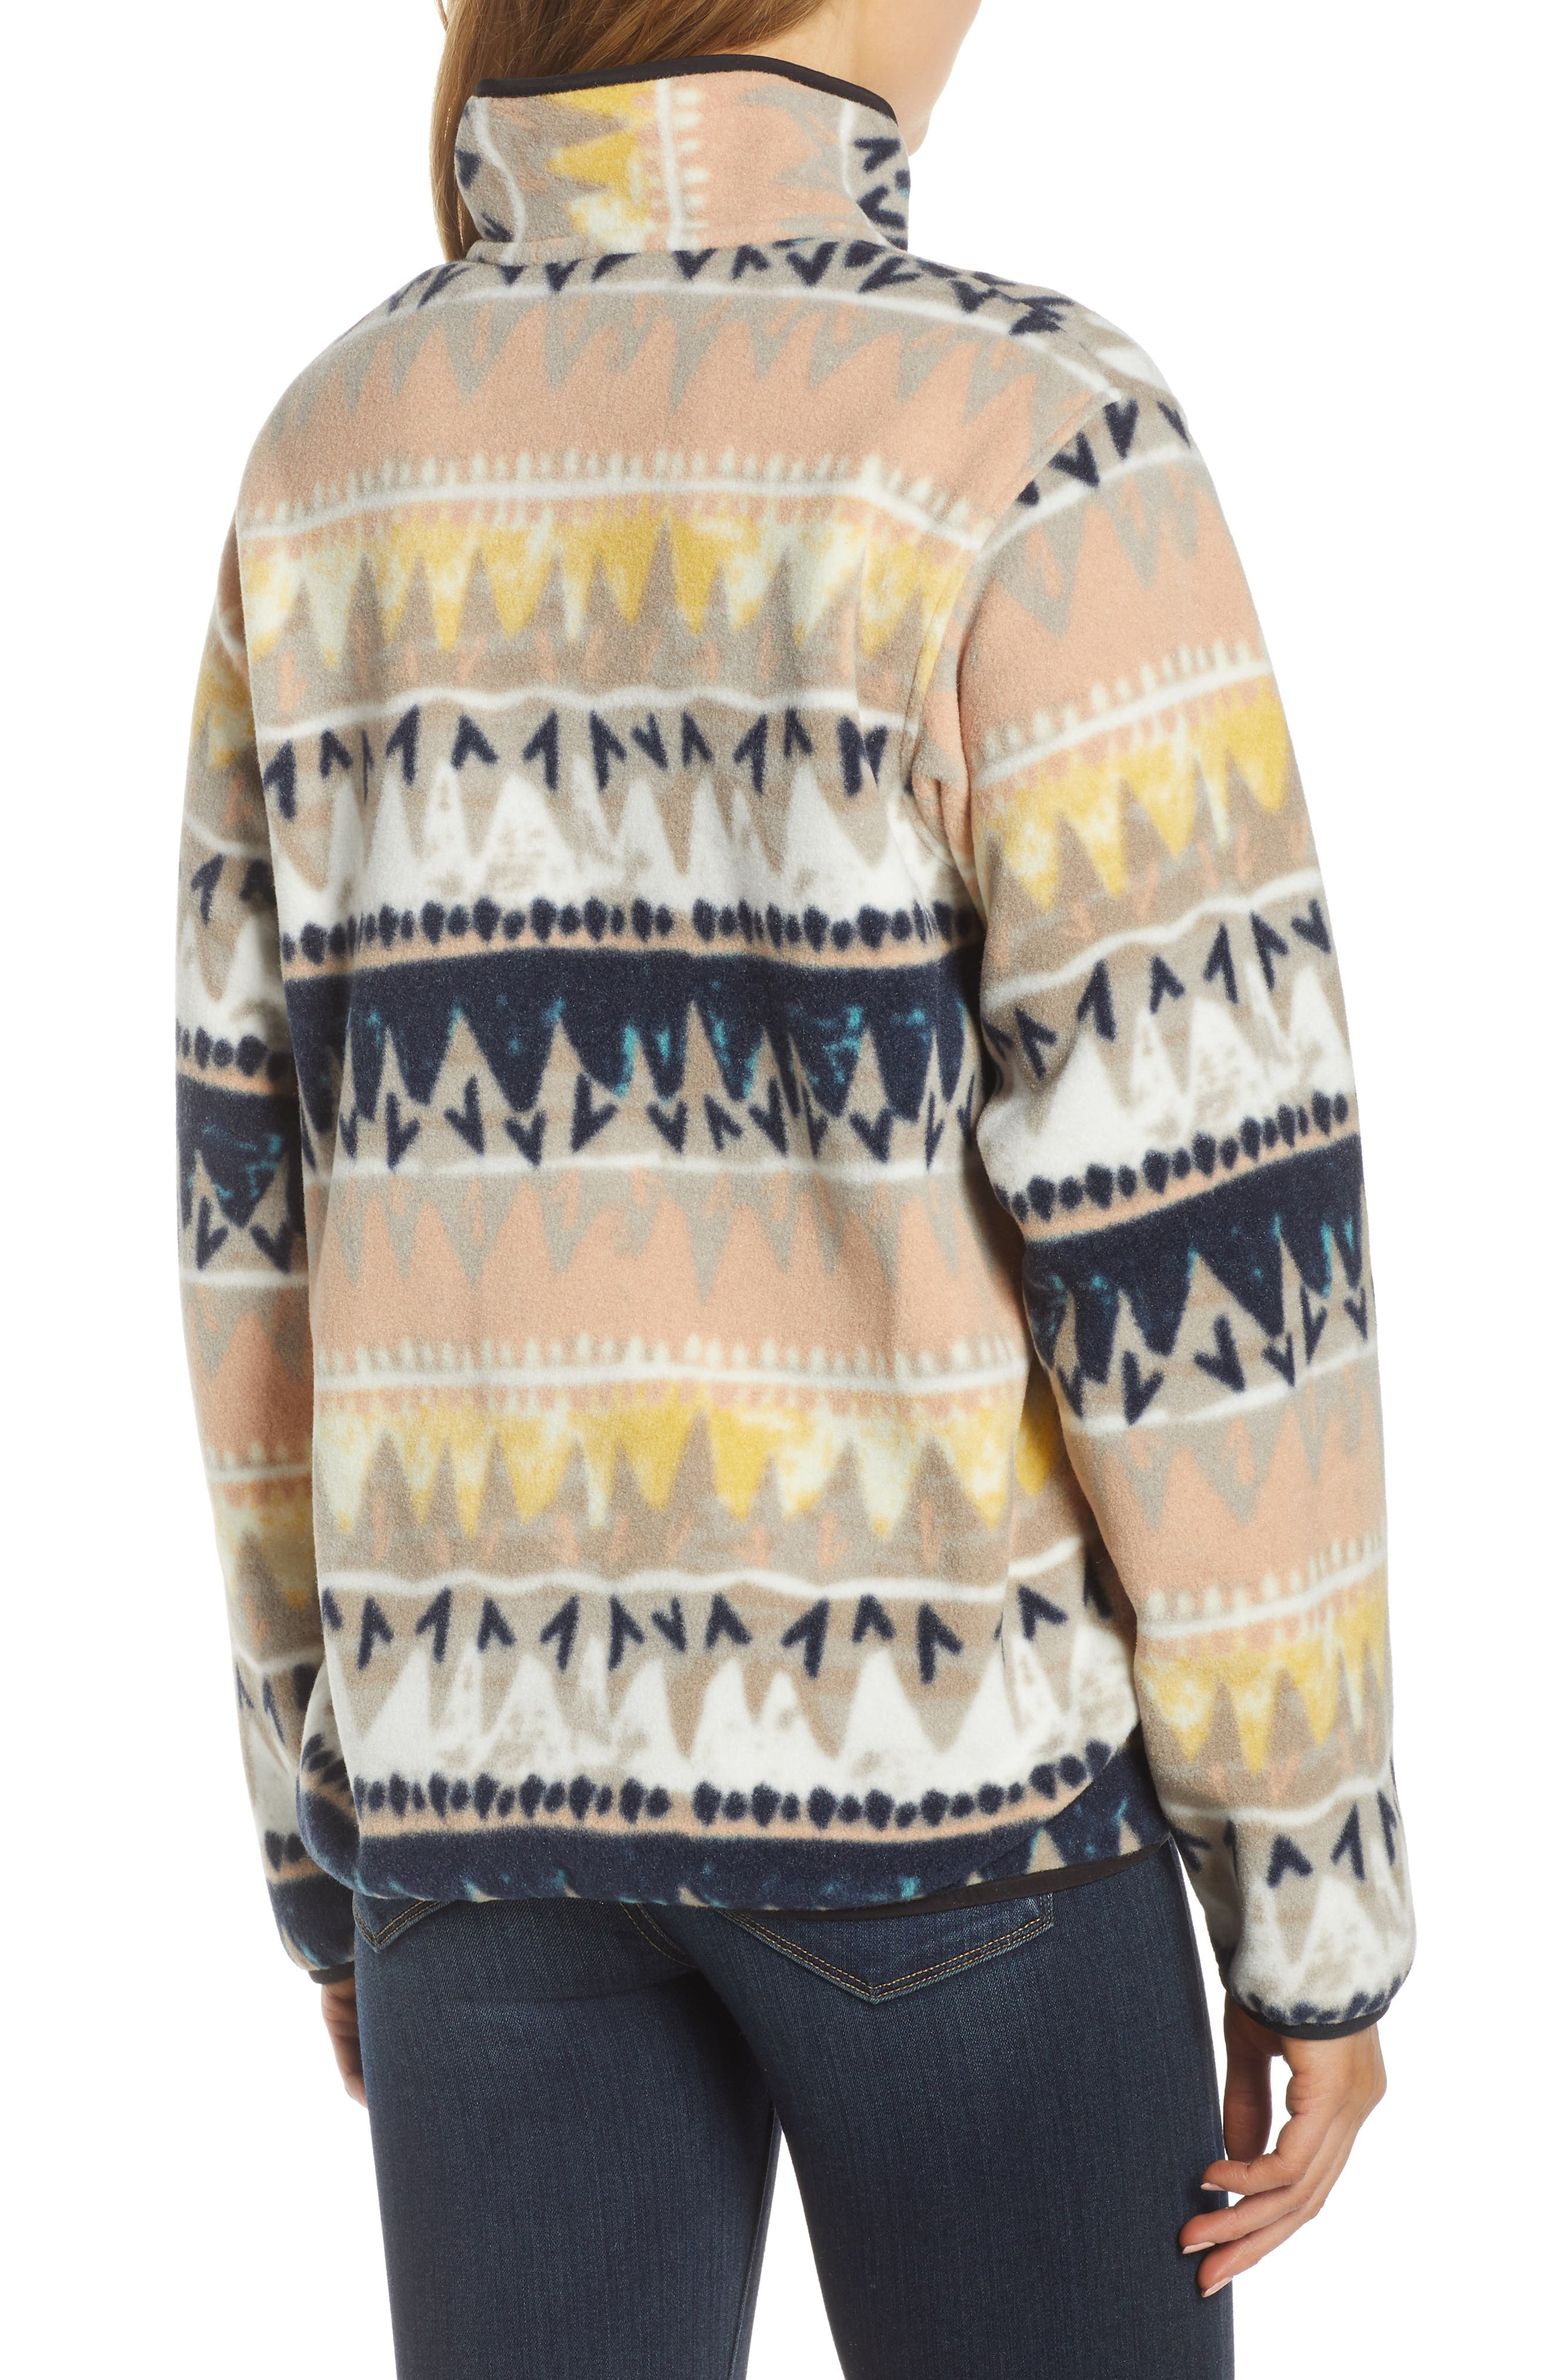 PATAGONIA, Synchilla Snap-T<sup>®</sup> Fleece Pullover, Alternate thumbnail 2, color, BANDICOOT/ MARROW GREY